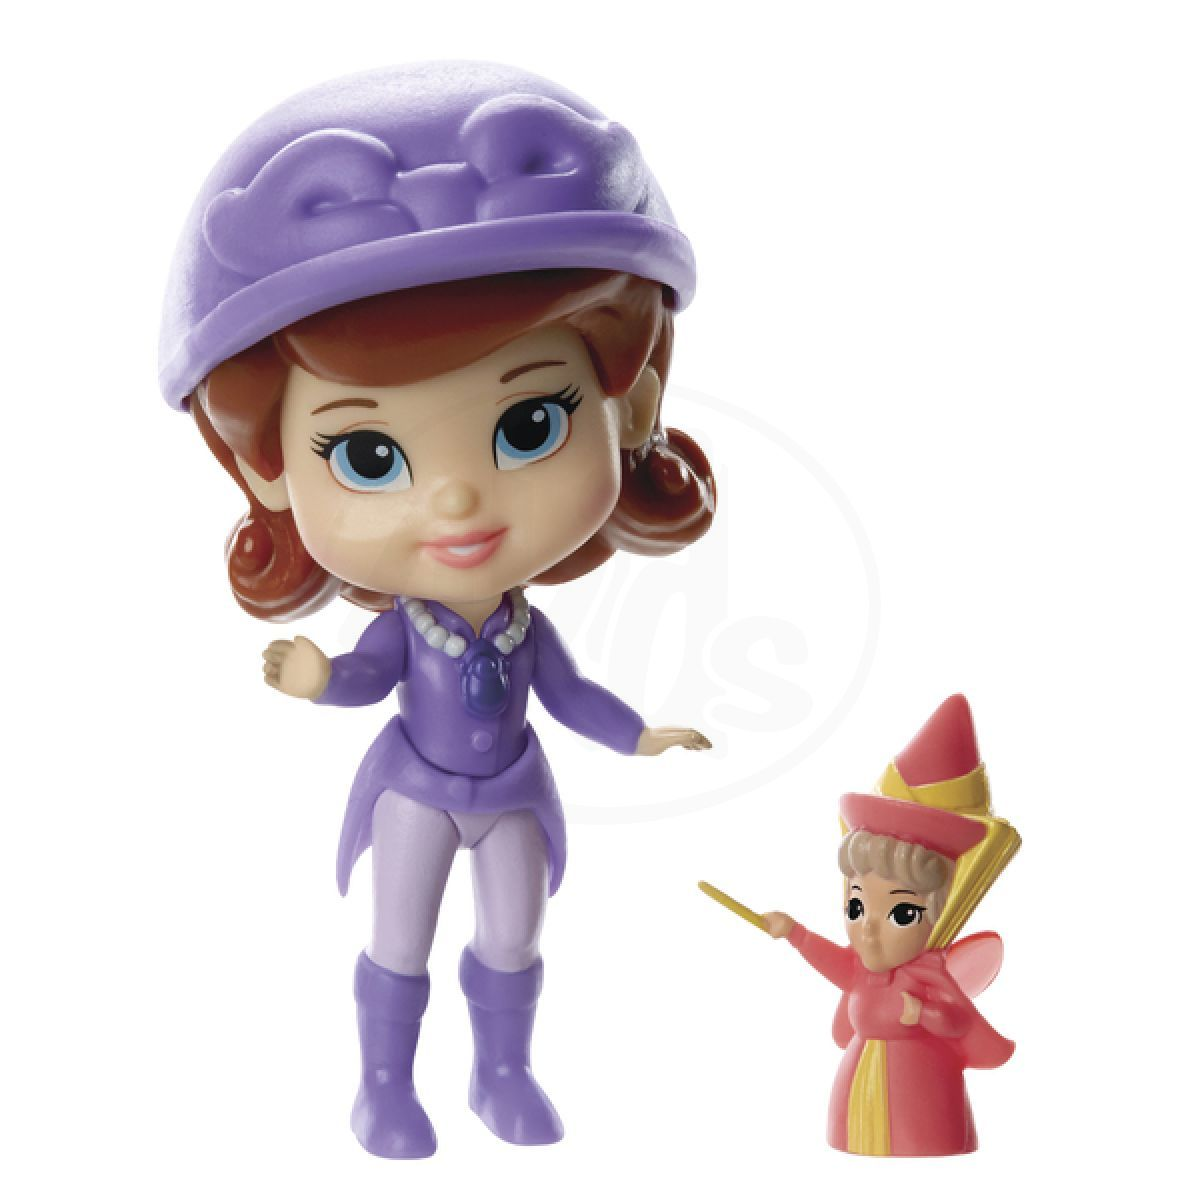 Jakks Pacific Disney Mini princezna a kamarád - Sofia and Flora